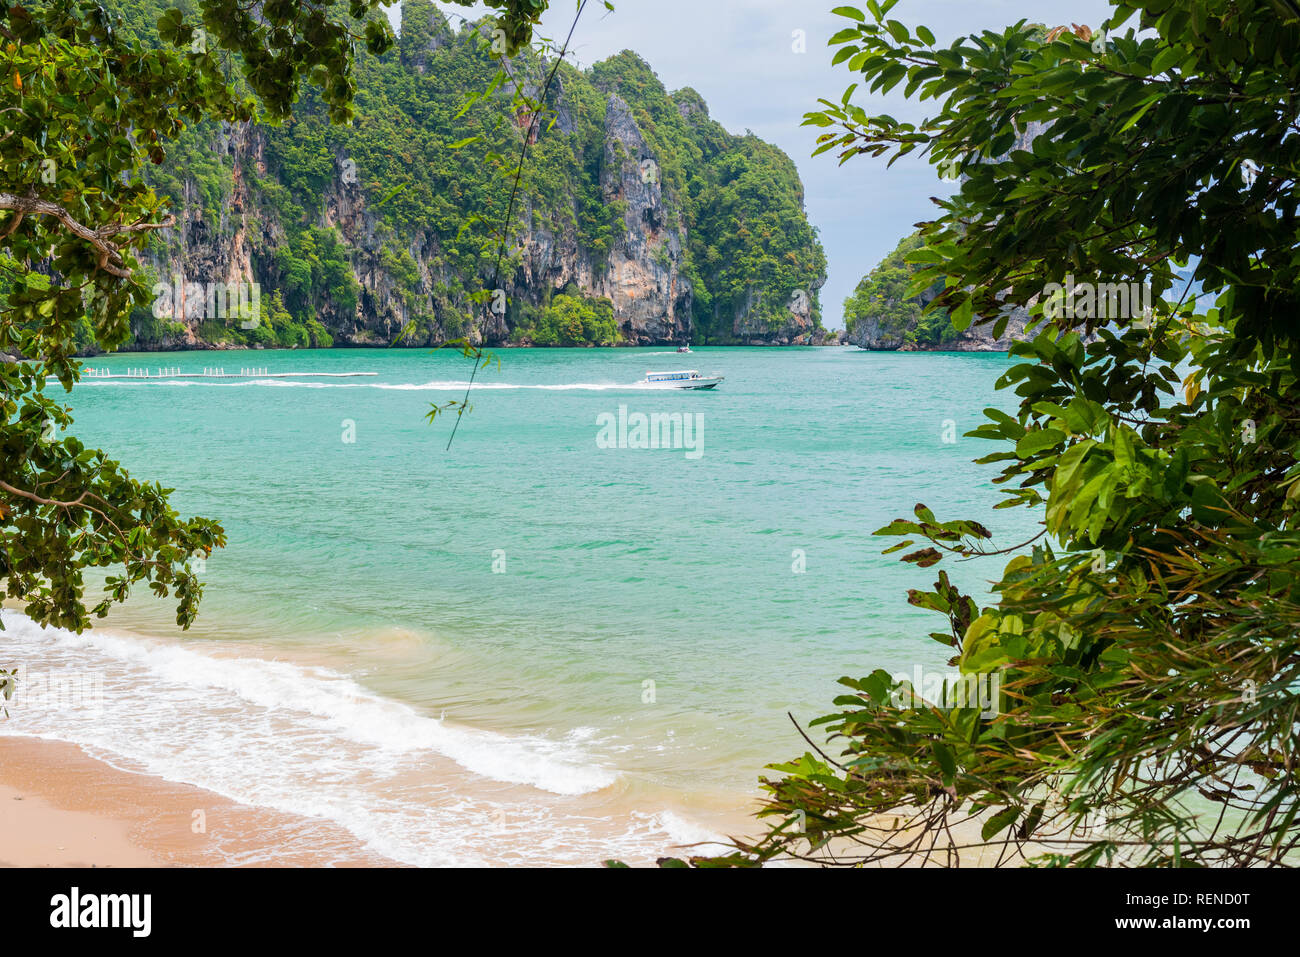 Ao Nang, Krabi - Pai Plong Beach through the foliage of the Monkey Trail. - Stock Image